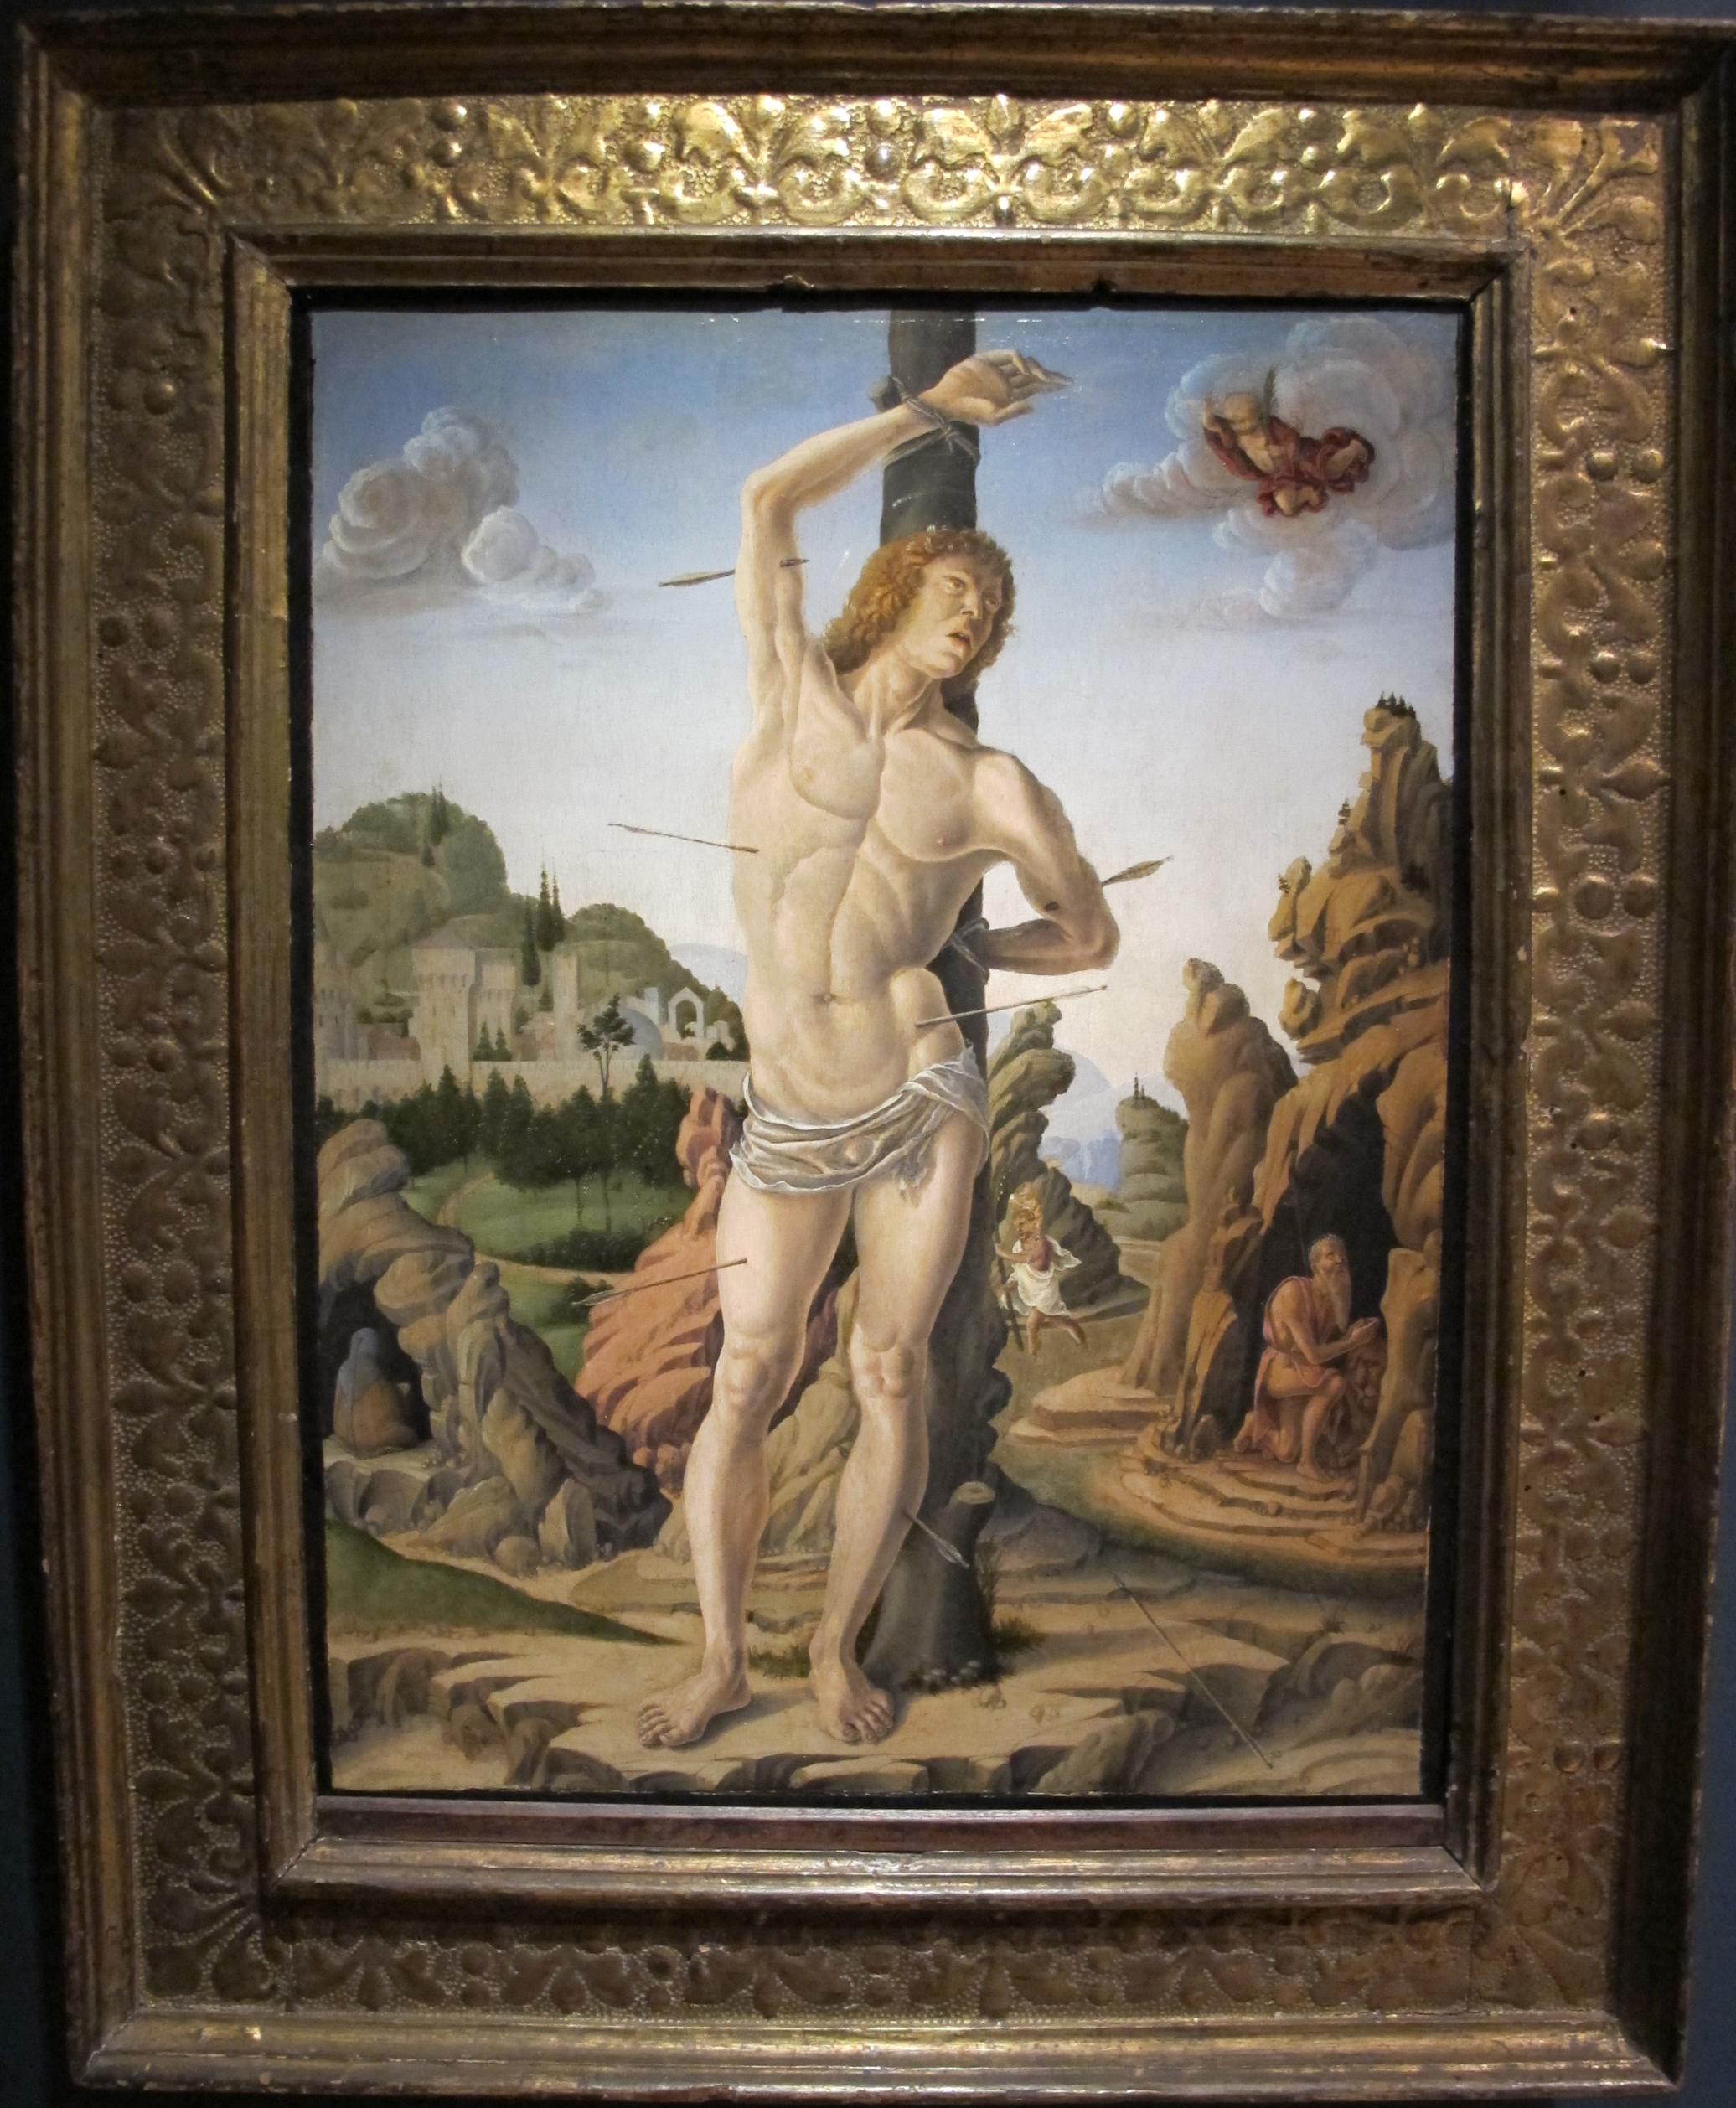 File:Marco zoppo, san sebastiano, 1475-78 ca..JPG - Wikimedia Commons